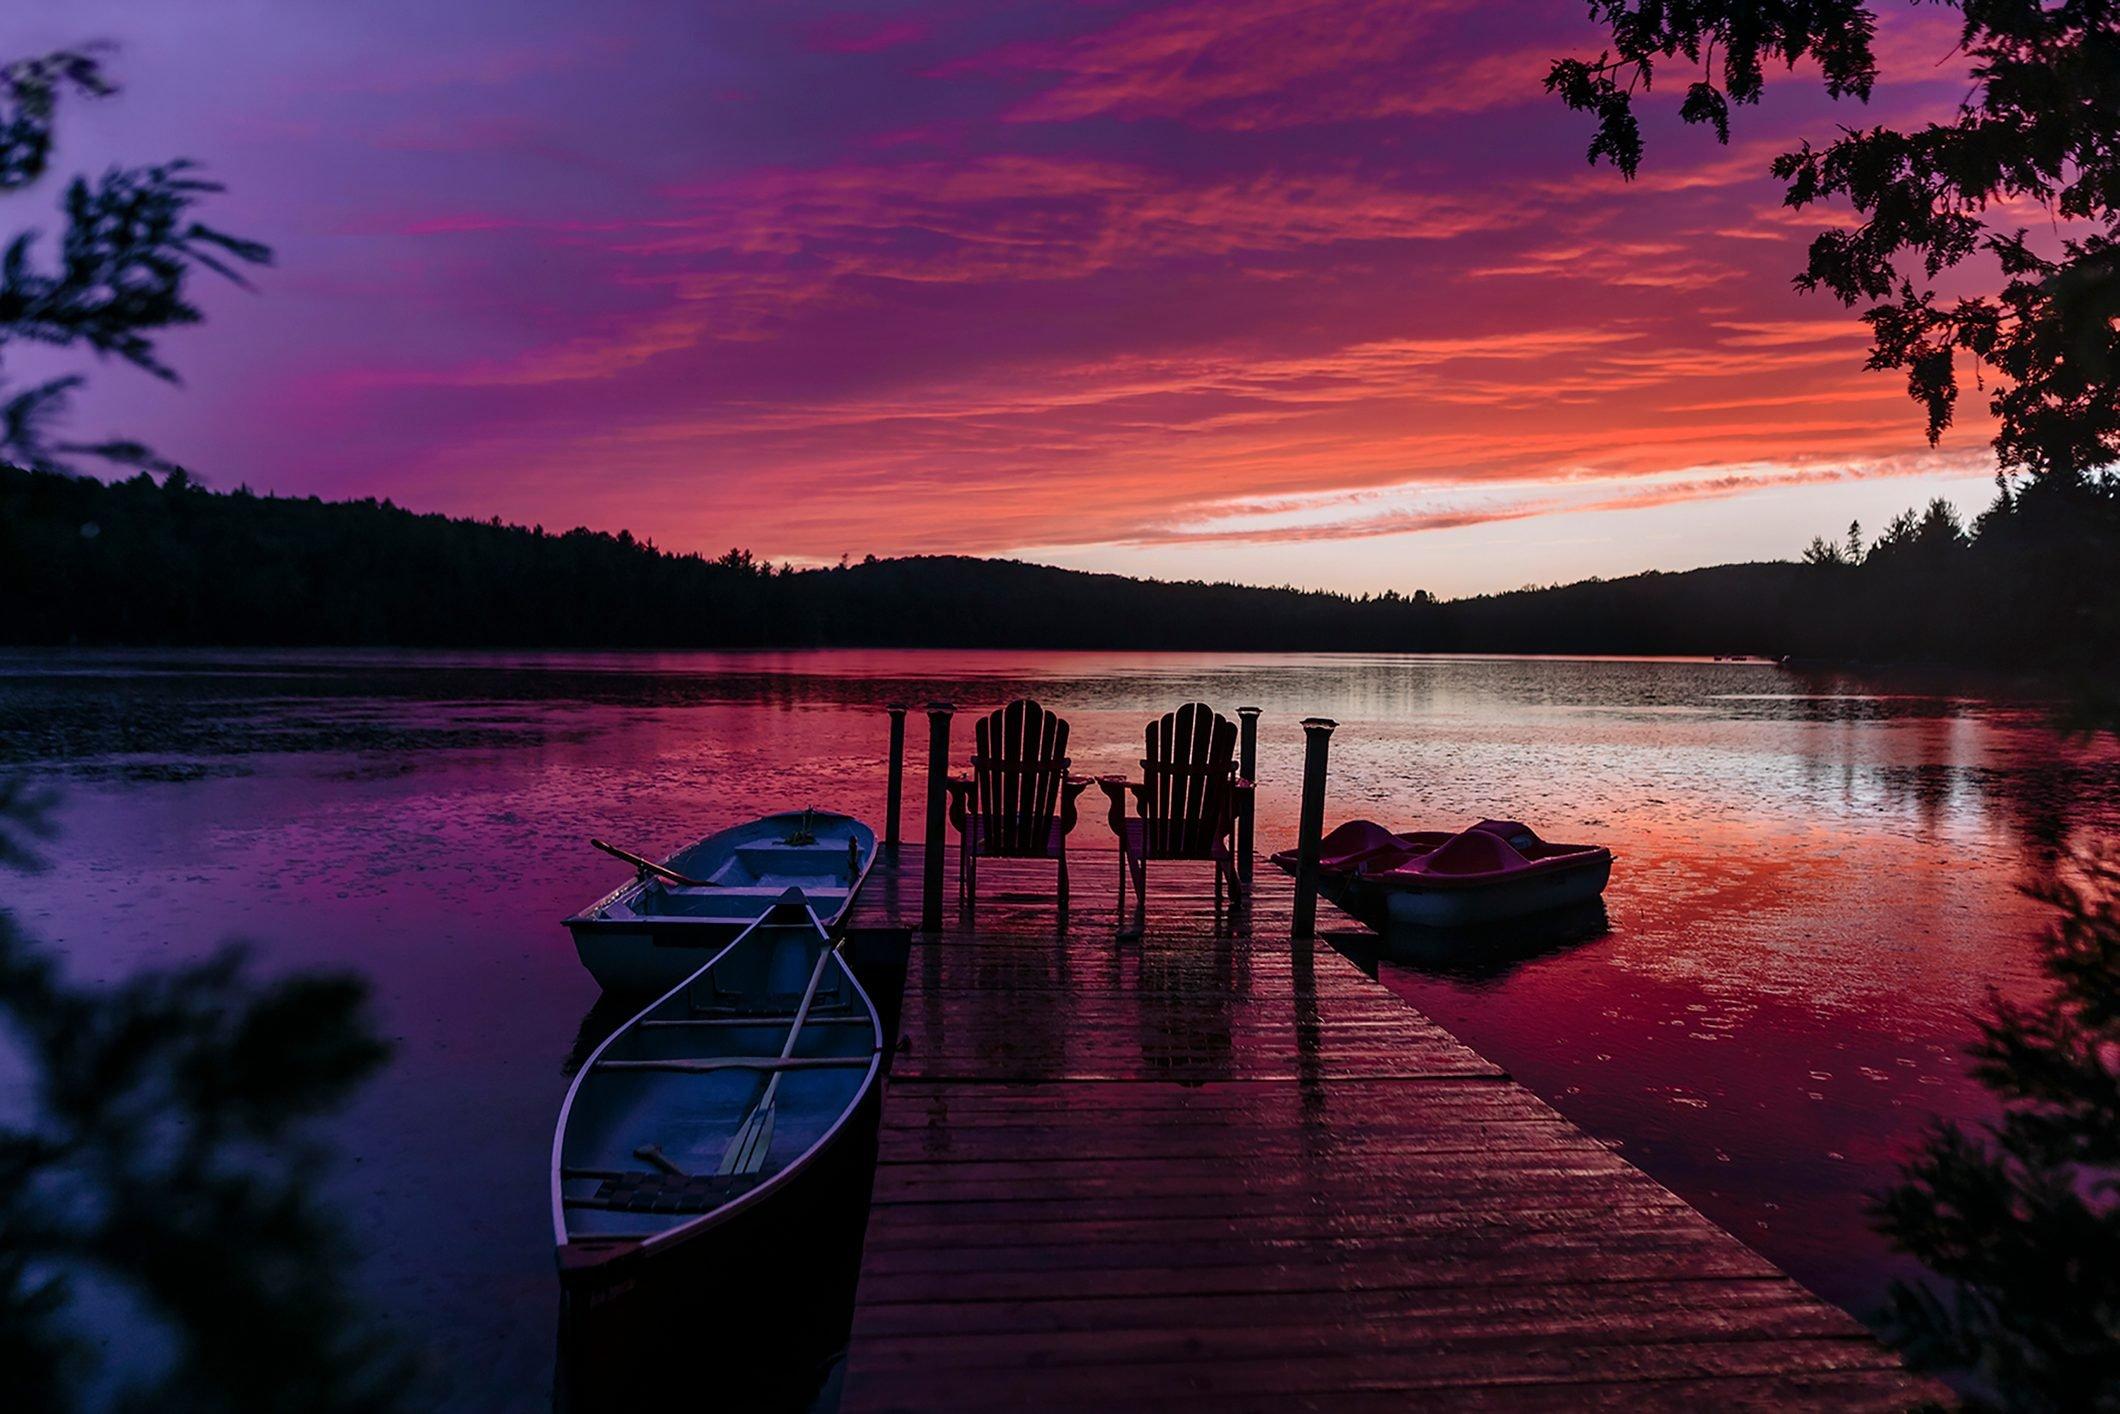 rainy purple summer sunset at the dock